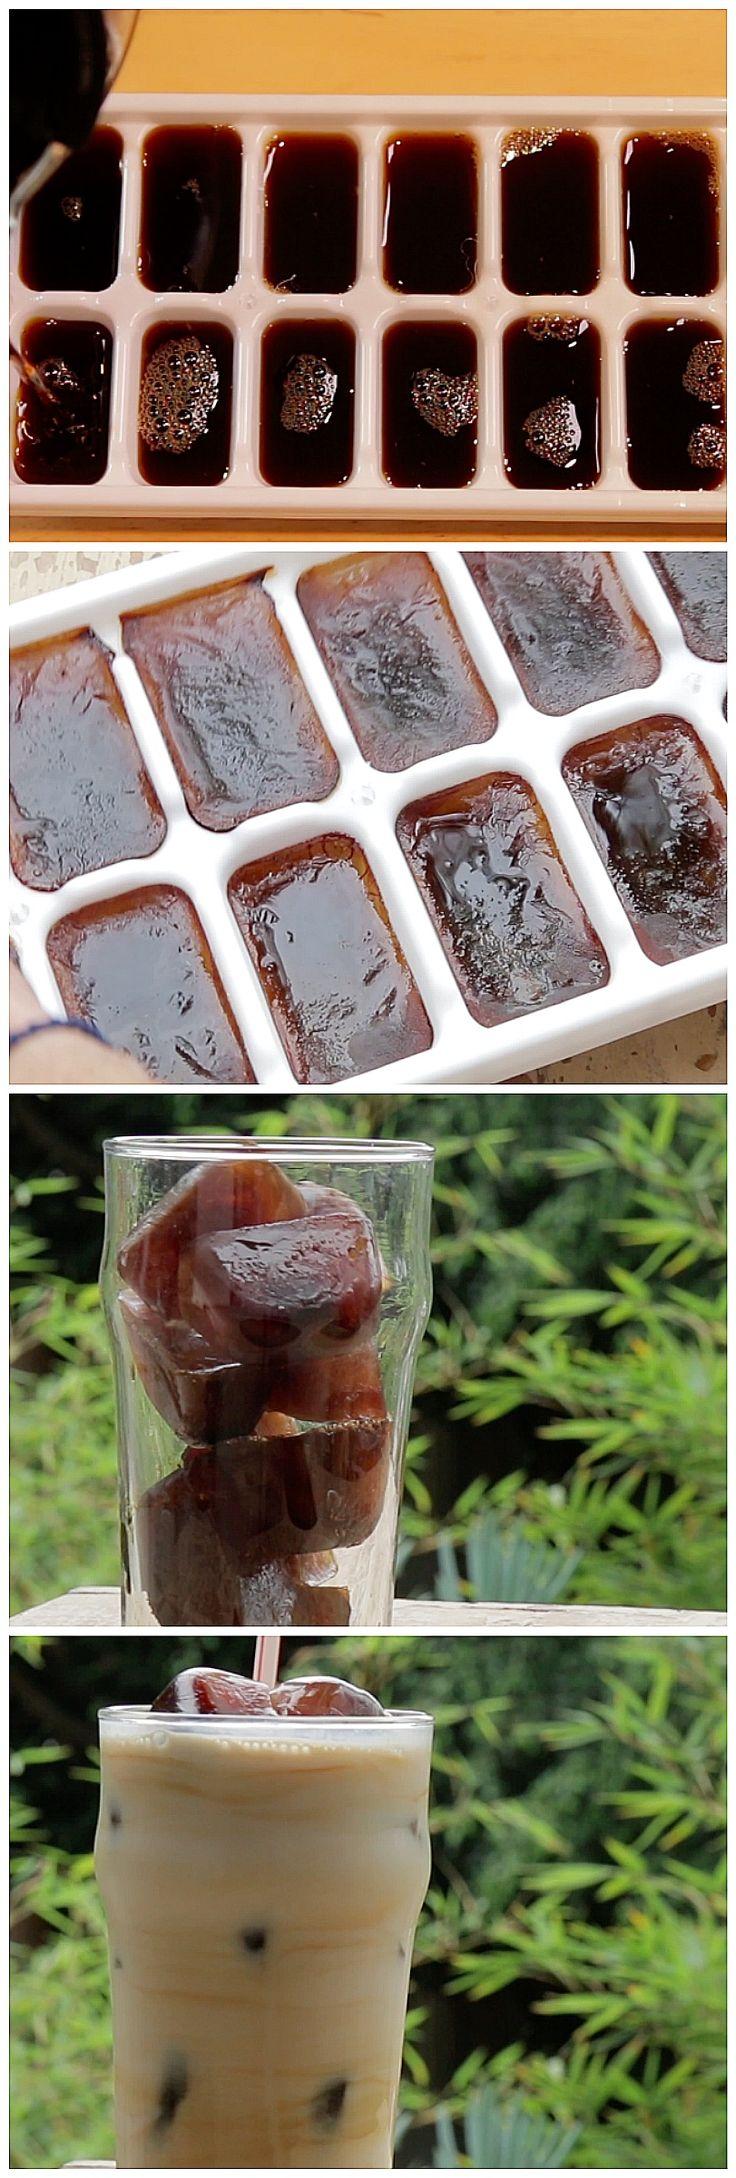 Easy way to make iced coffee